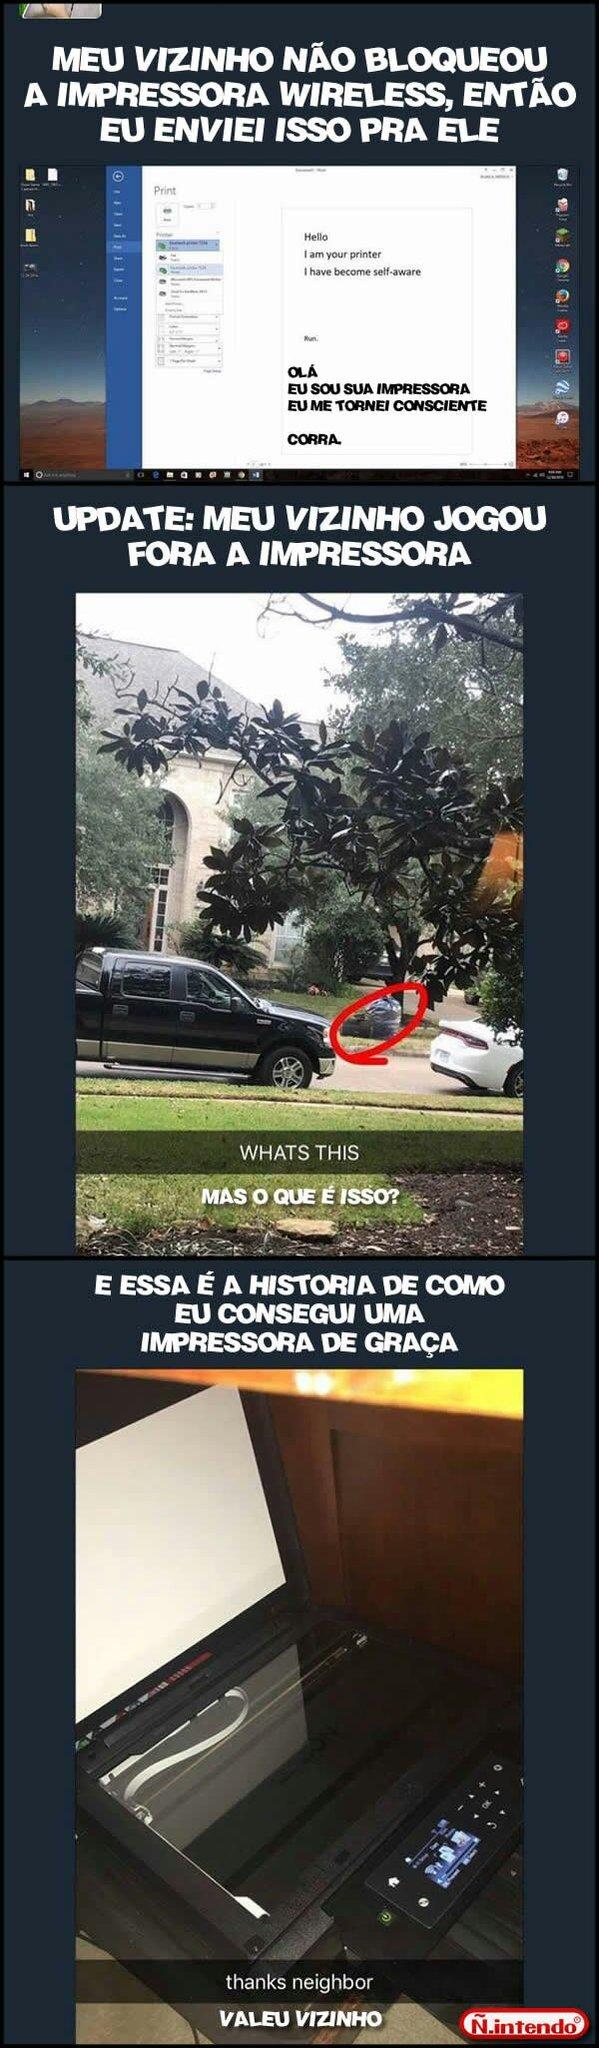 IMPRESSORA DE GRAÇA! - meme